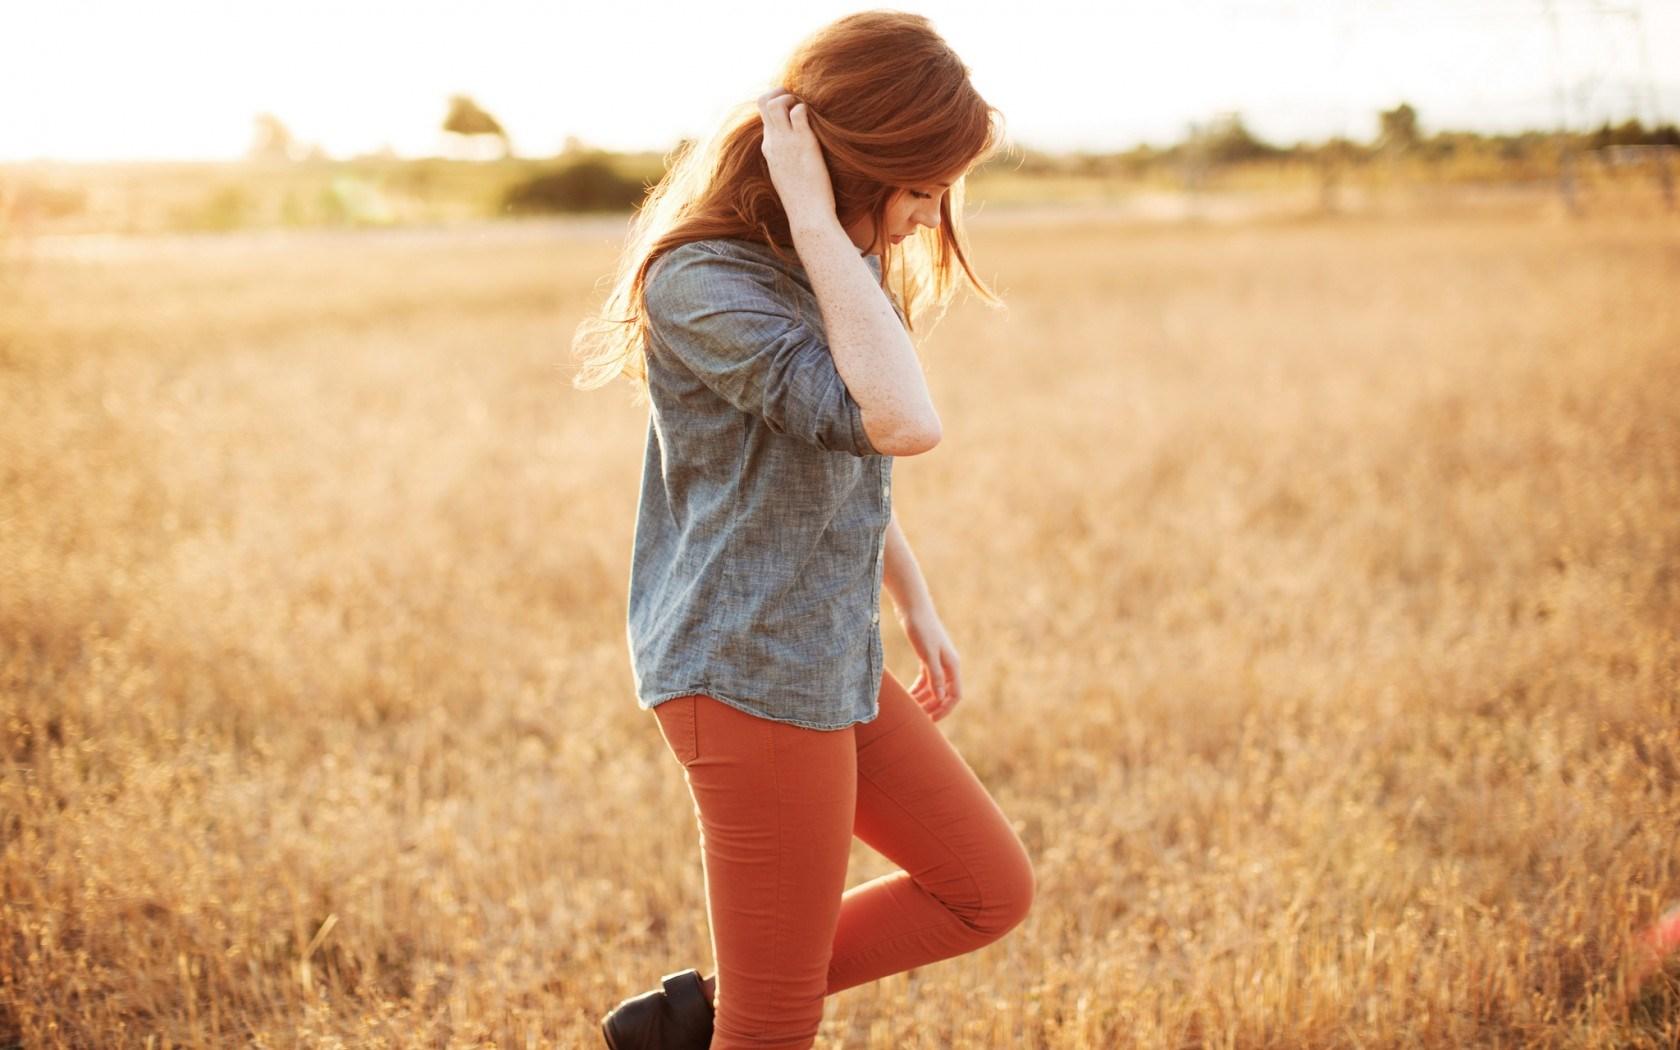 Field Redhead Girl Mood